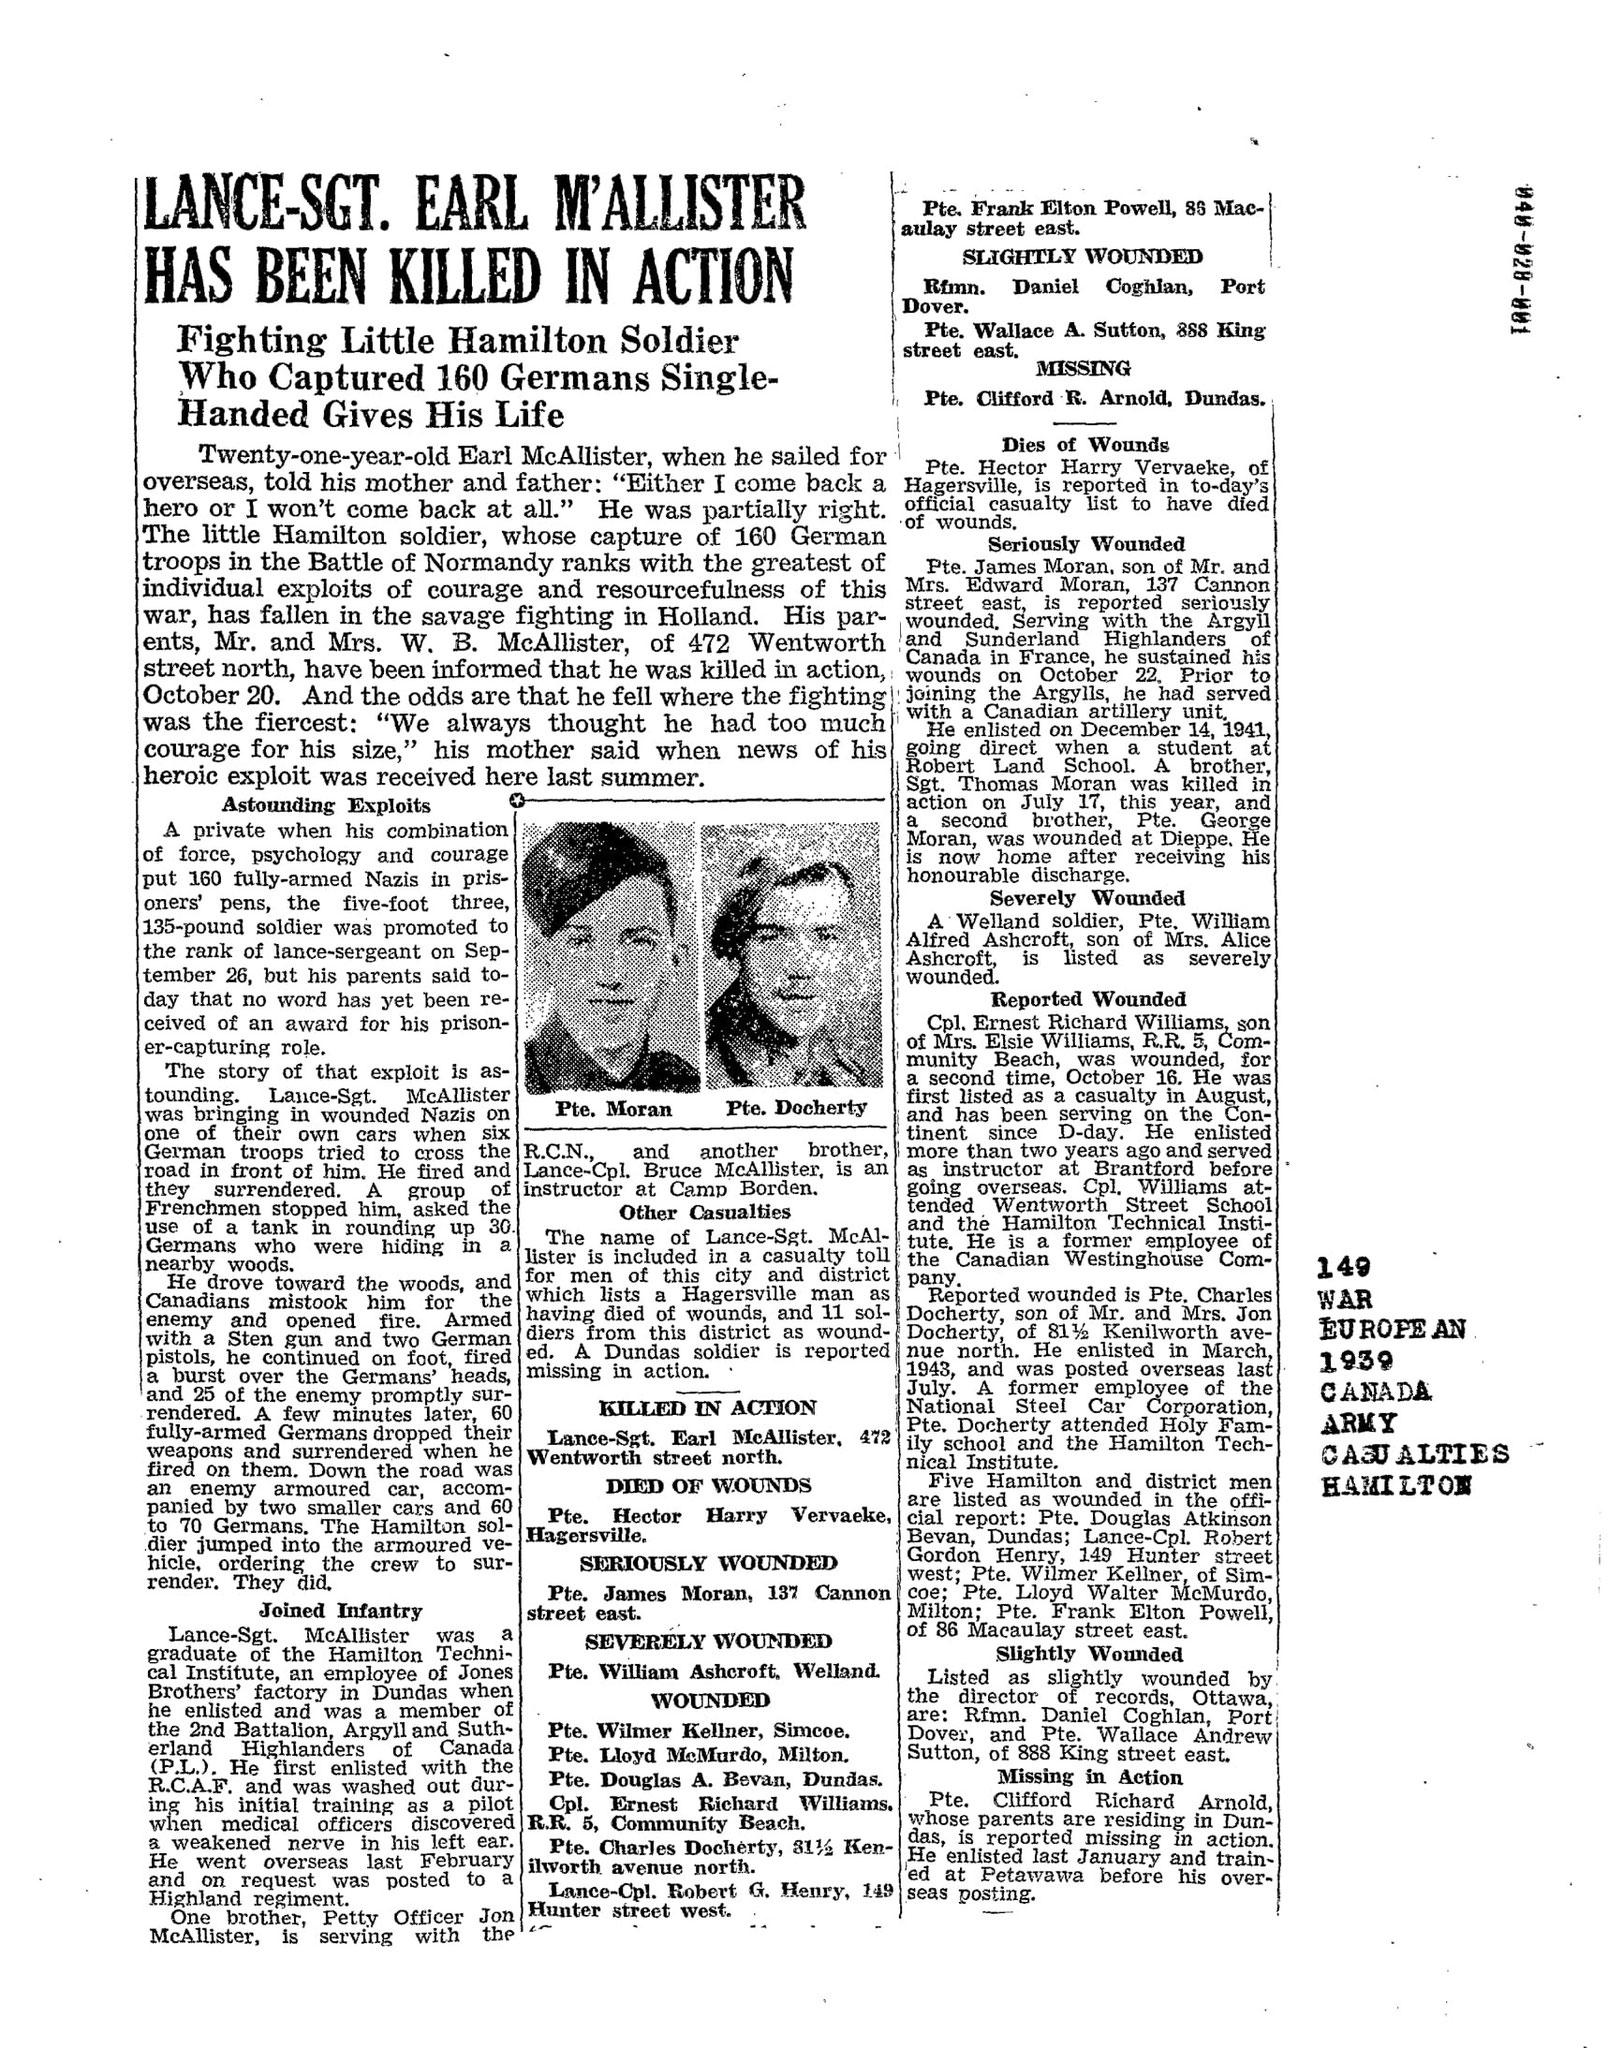 Hamilton Spectator 28-10-1944